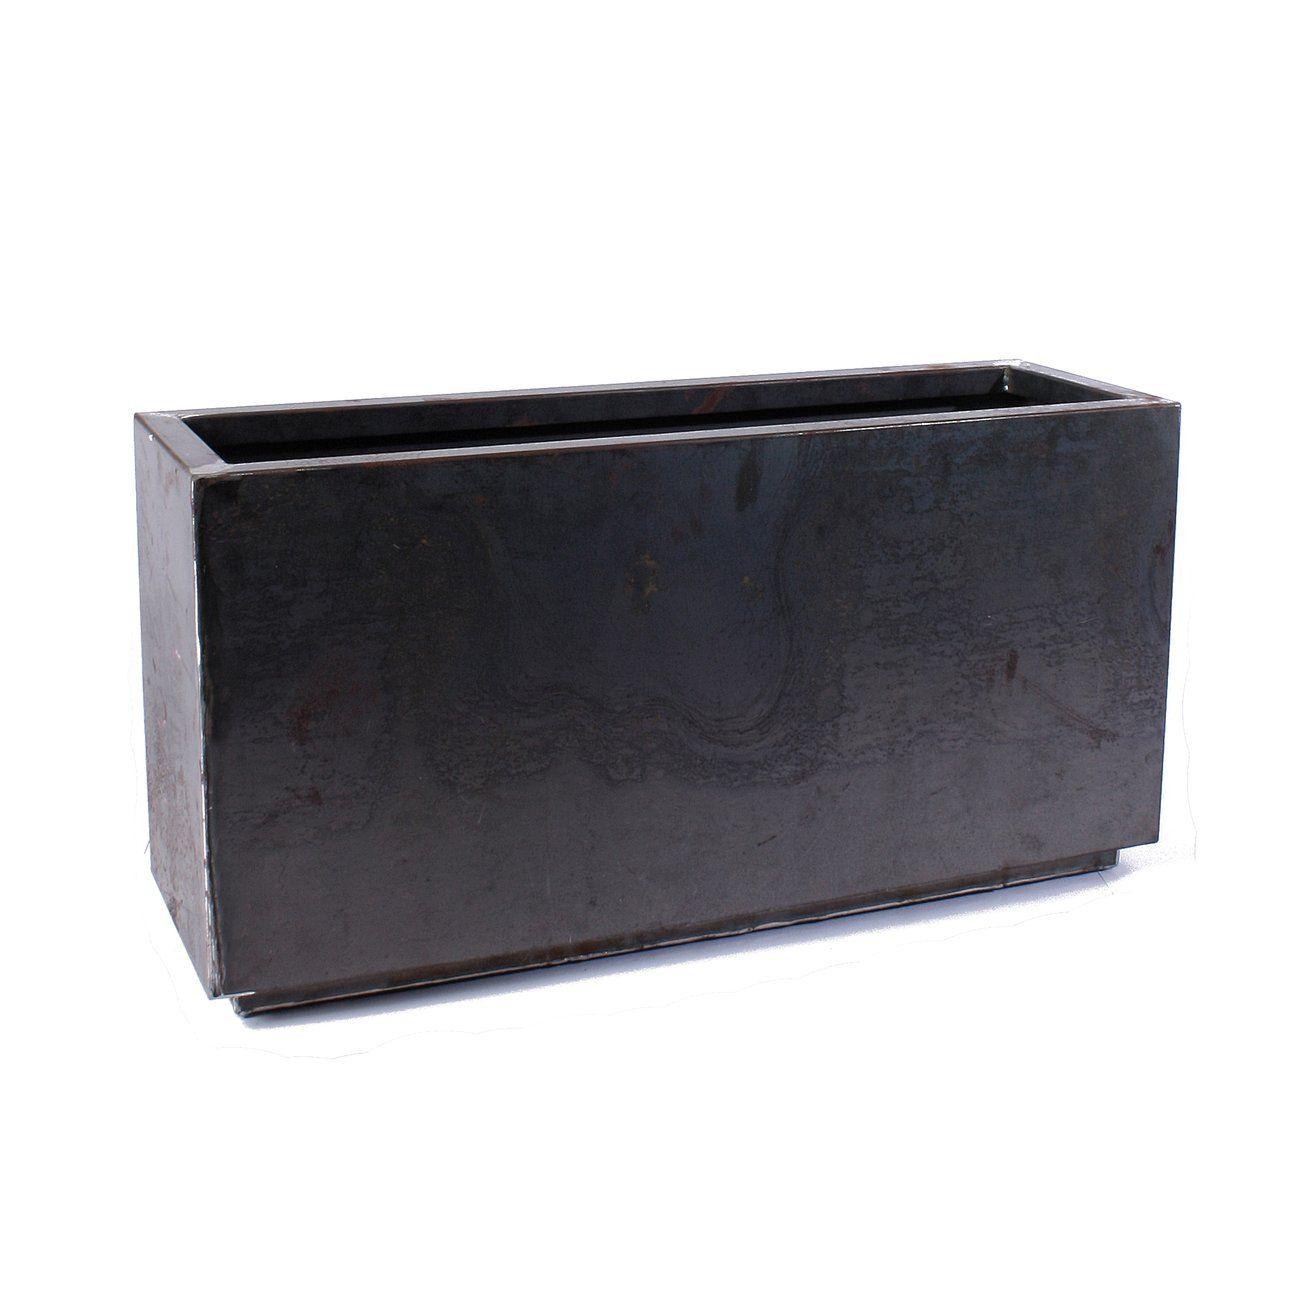 Corten Steel Long Box Planter In 2020 Corten Steel 640 x 480